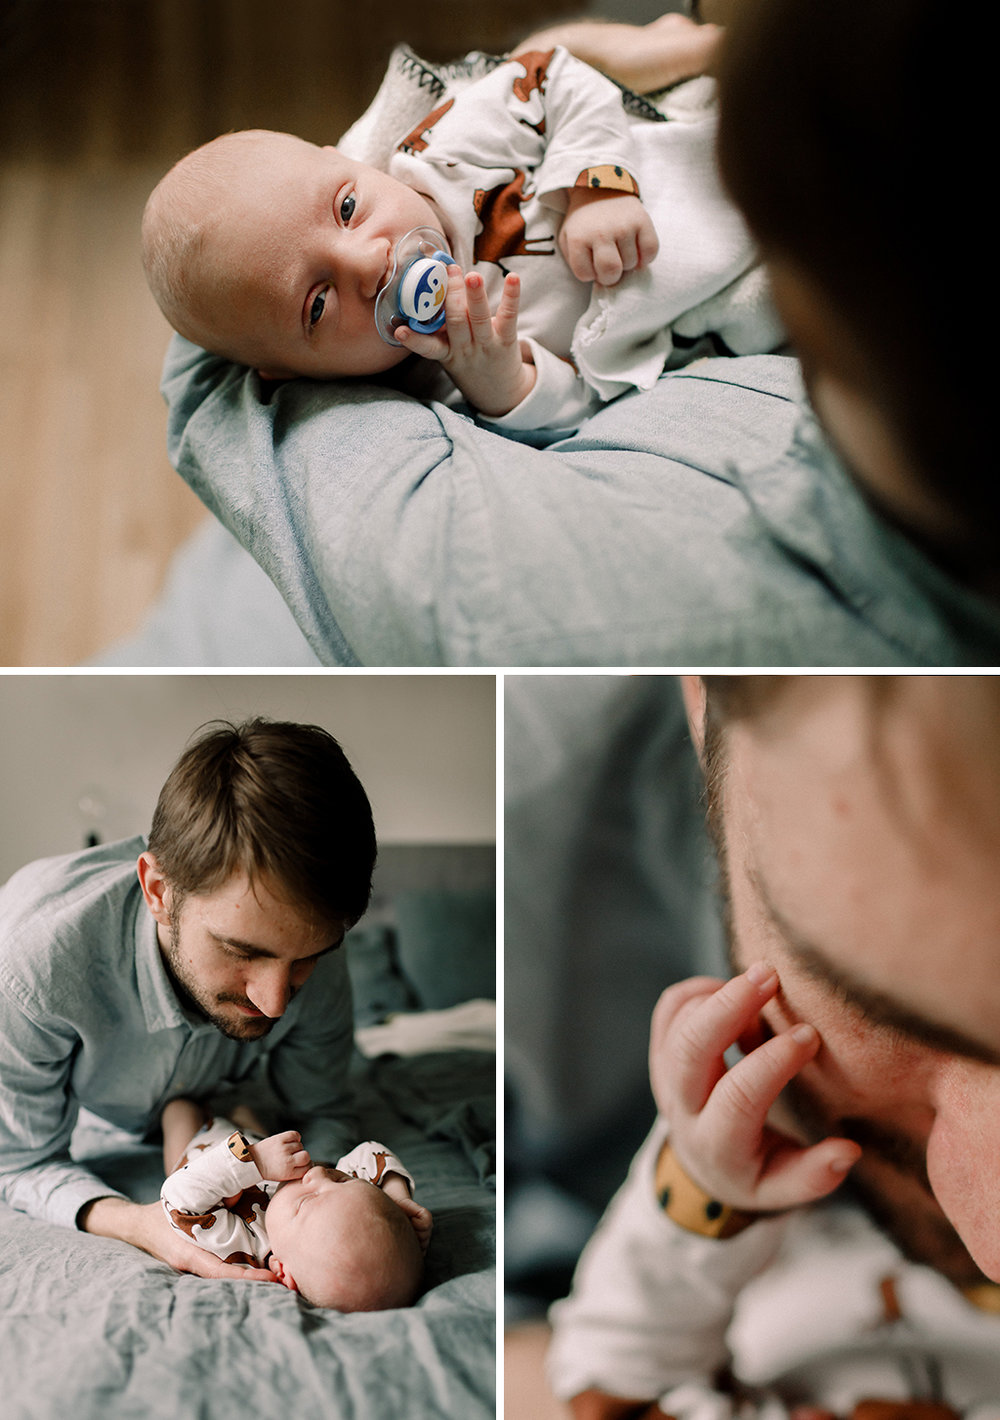 Newborn_Nyfoddfotografering_Stockholm_Familjefotograf_11.jpg